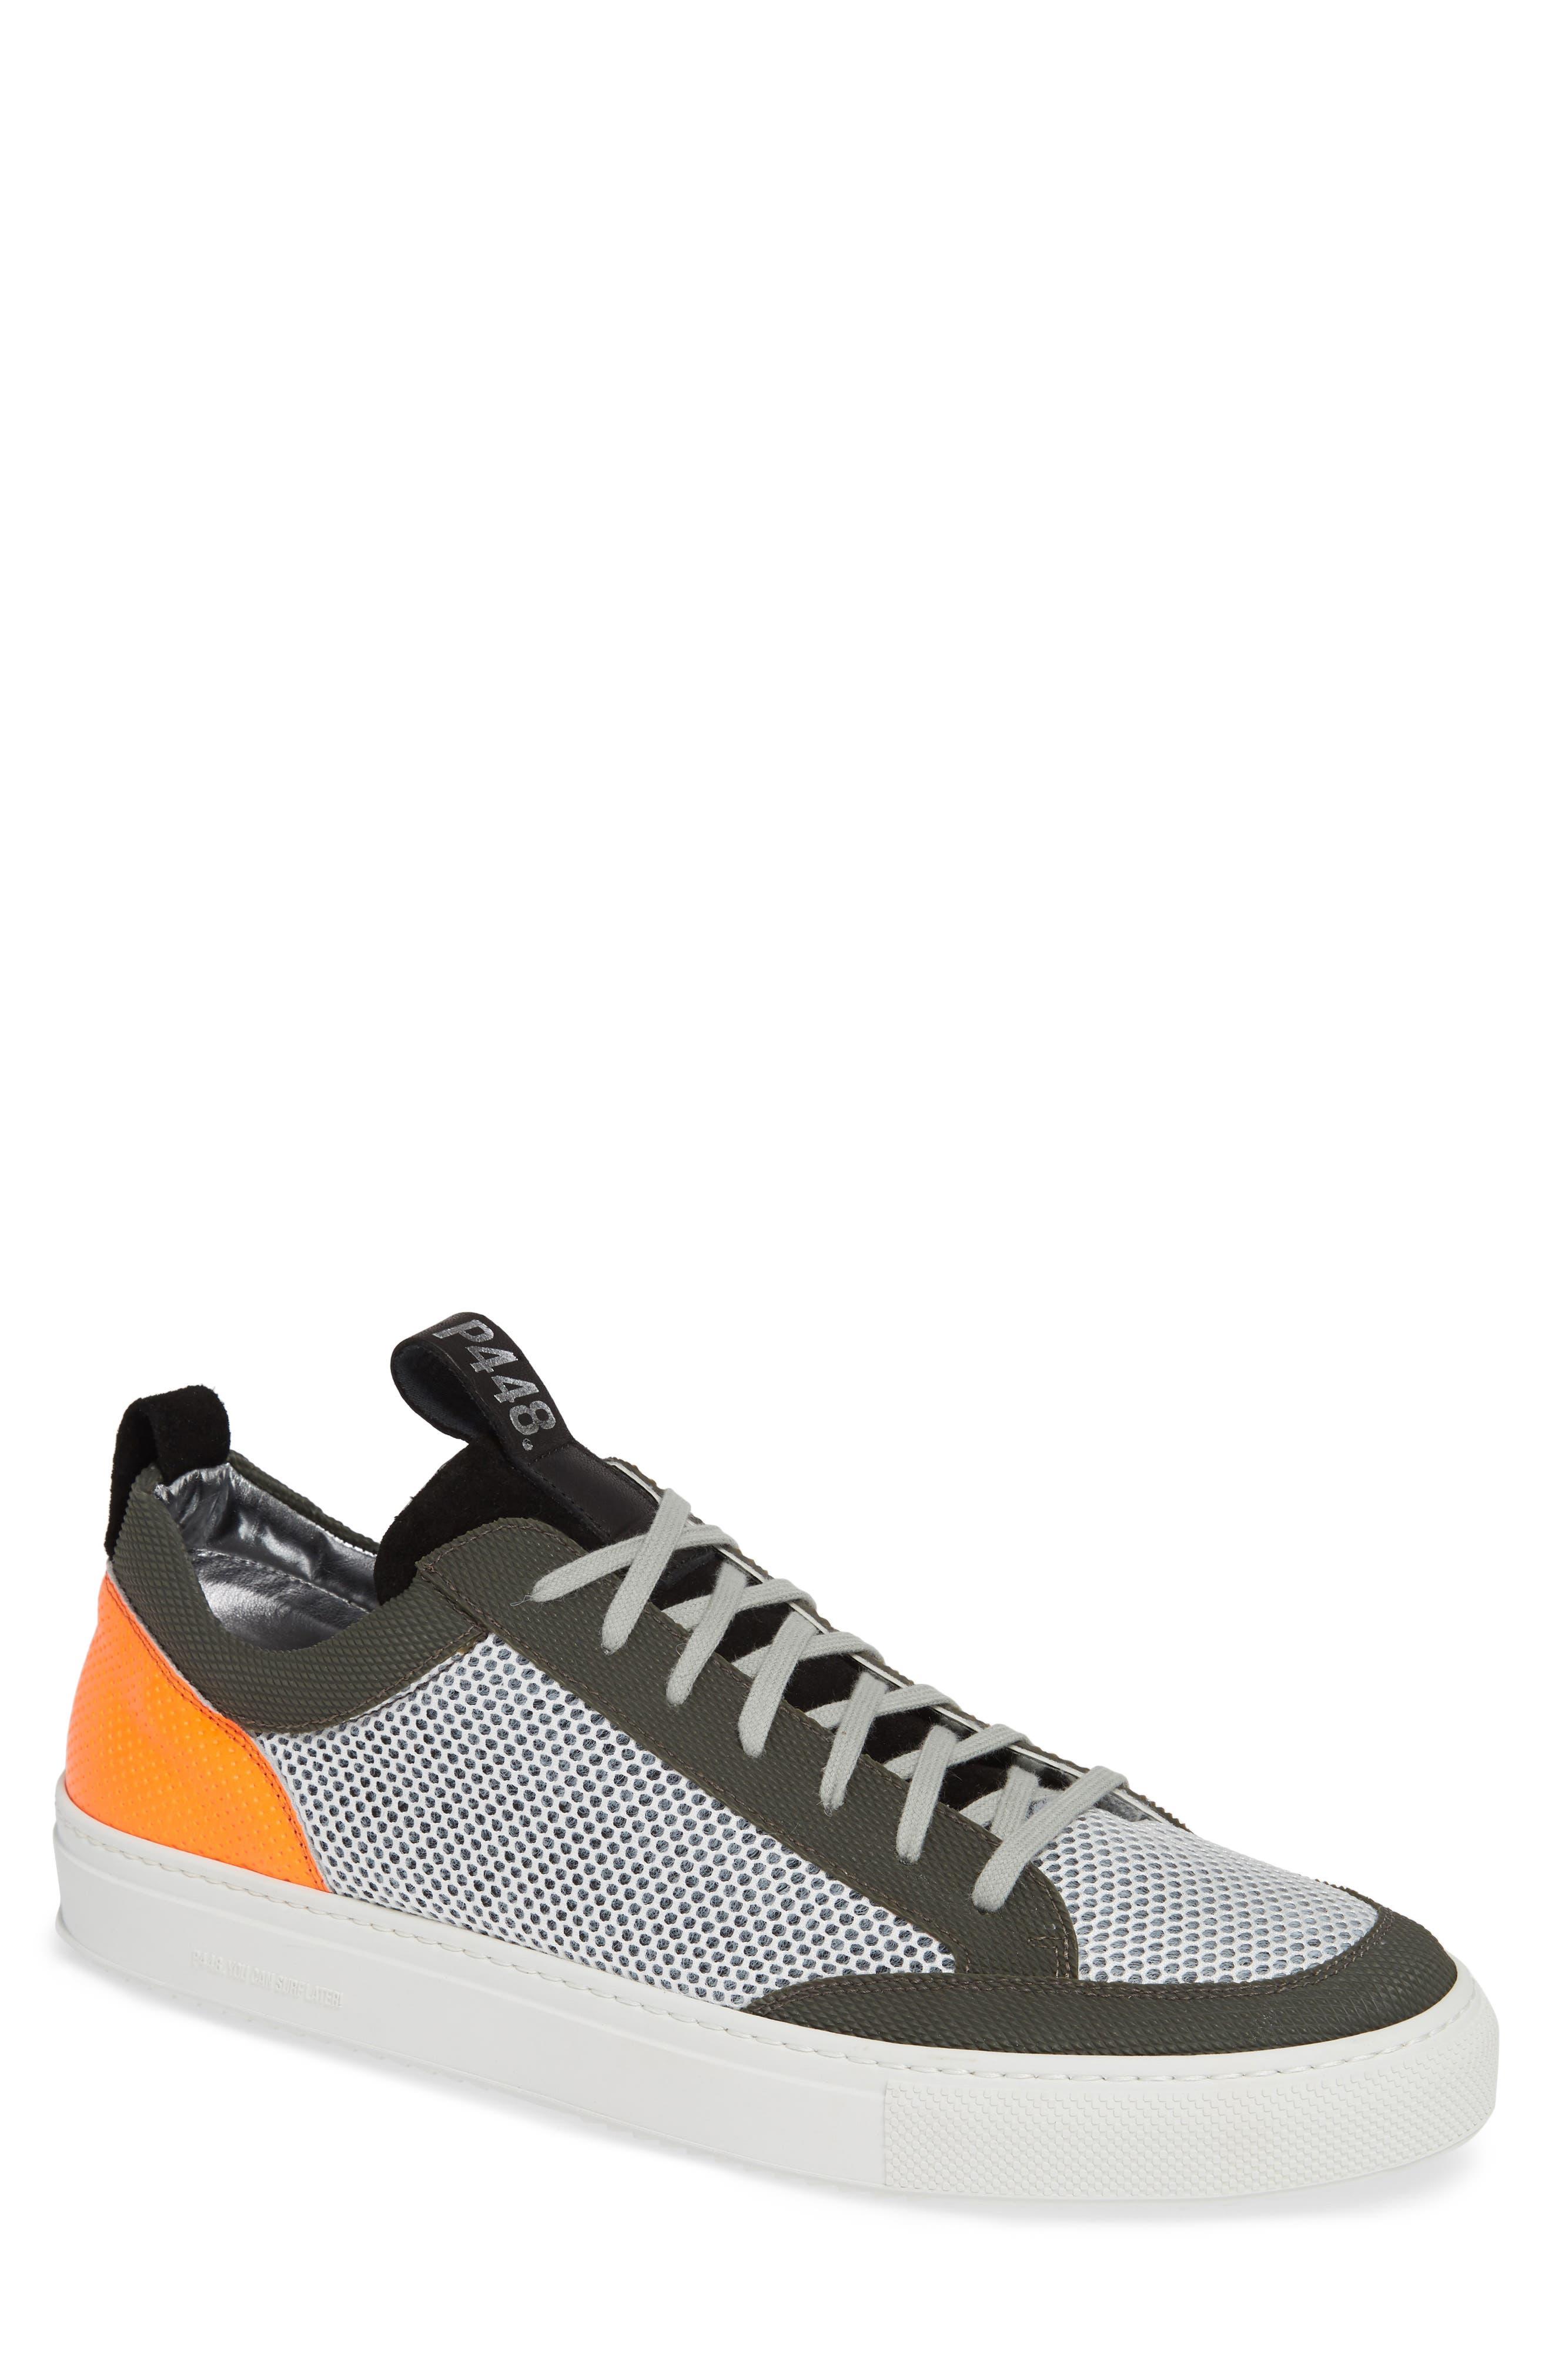 A8Soho Textured Sneaker,                         Main,                         color, WHITE/ GREY